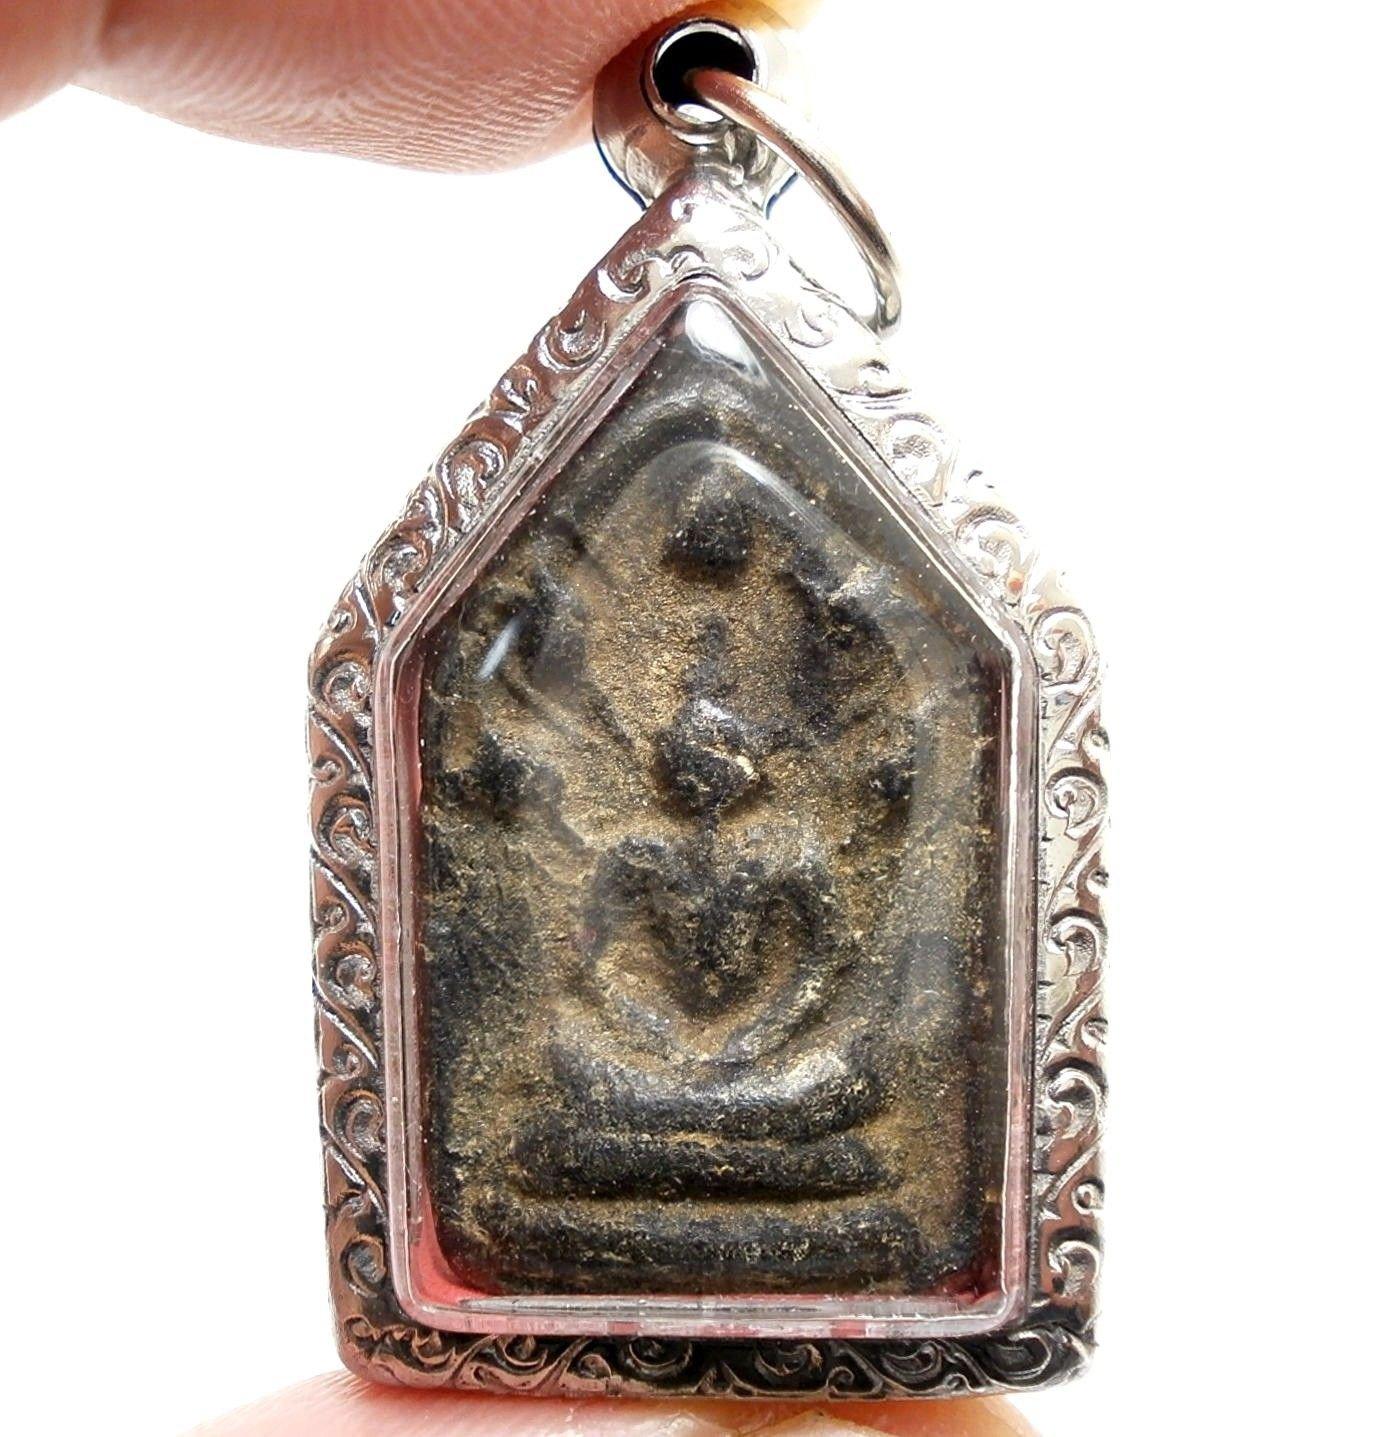 THAI BUDDHA AMULET PENDANT LP BOON NAKPROK NAGA LIFE PROTECTION FROM EVIL SPIRIT